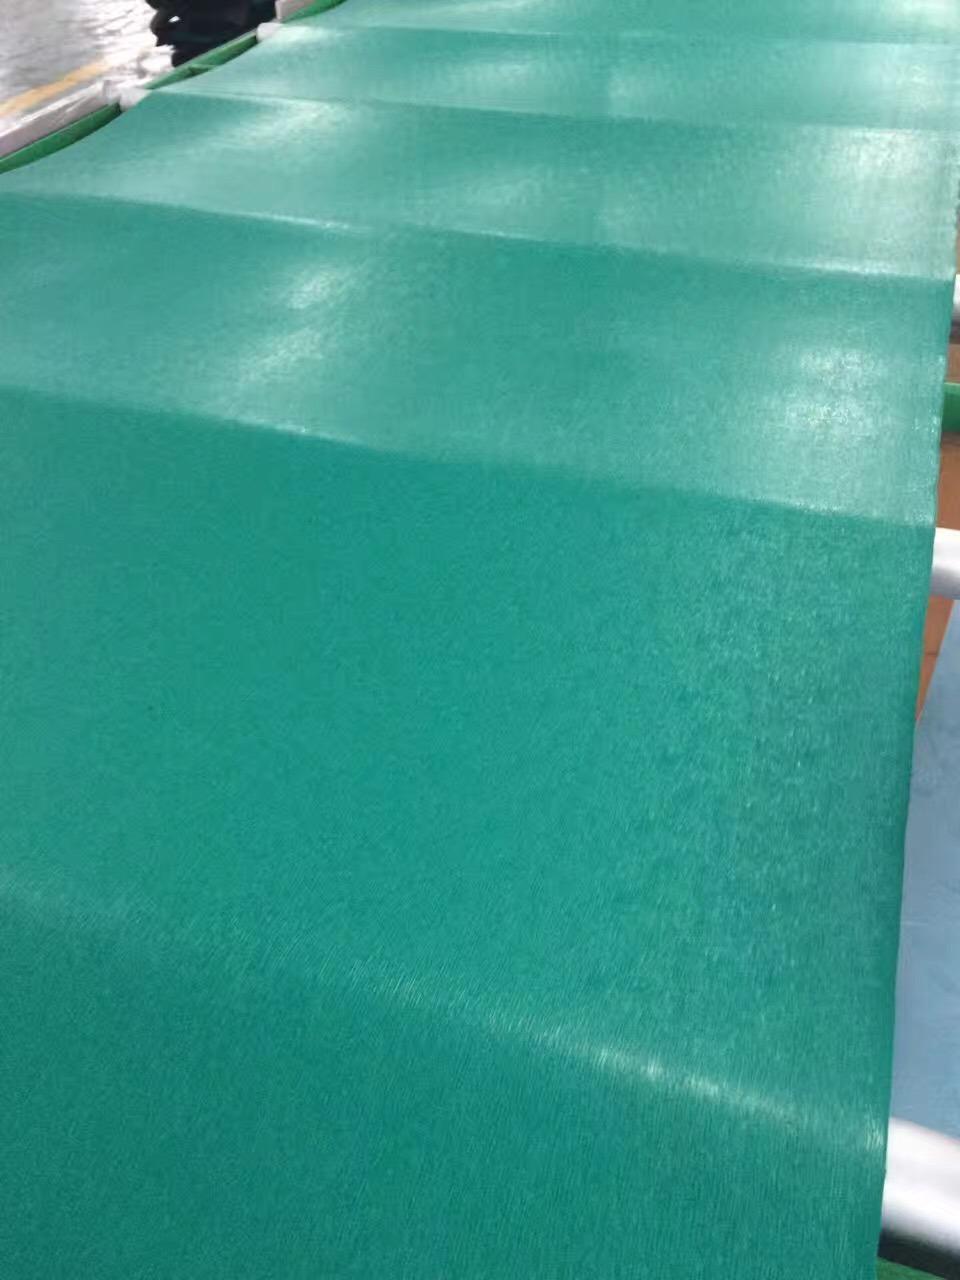 matting rubber trafficmaster mats x accessories black roll p garage ft flooring sq rolls